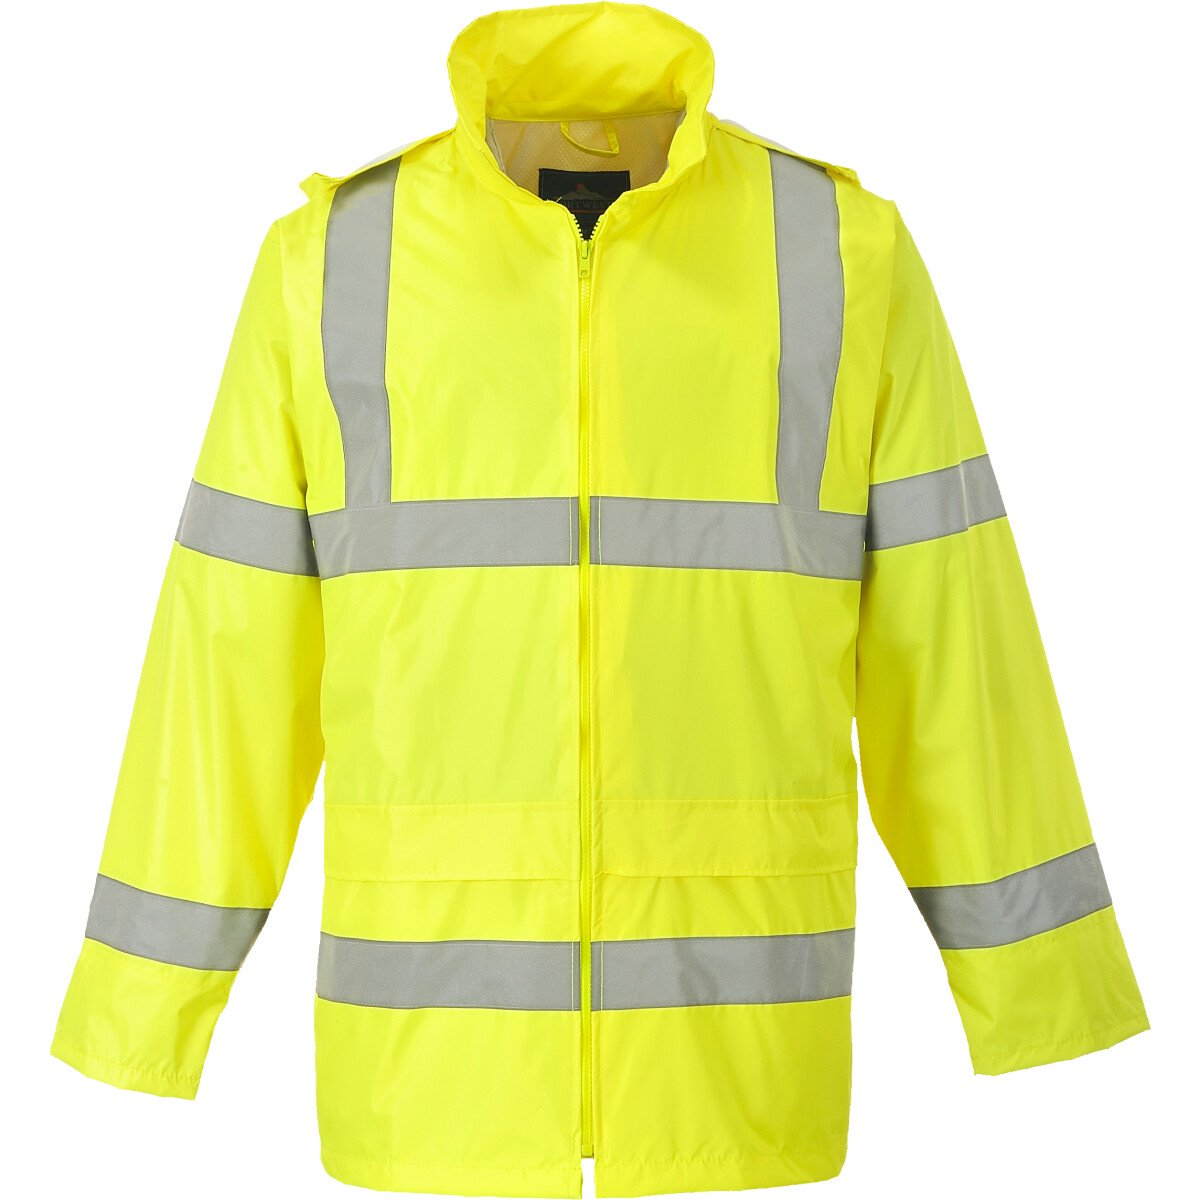 Portwest H440 Hi-Vis Rain Jacket  High Visibility Class 3 - Yellow